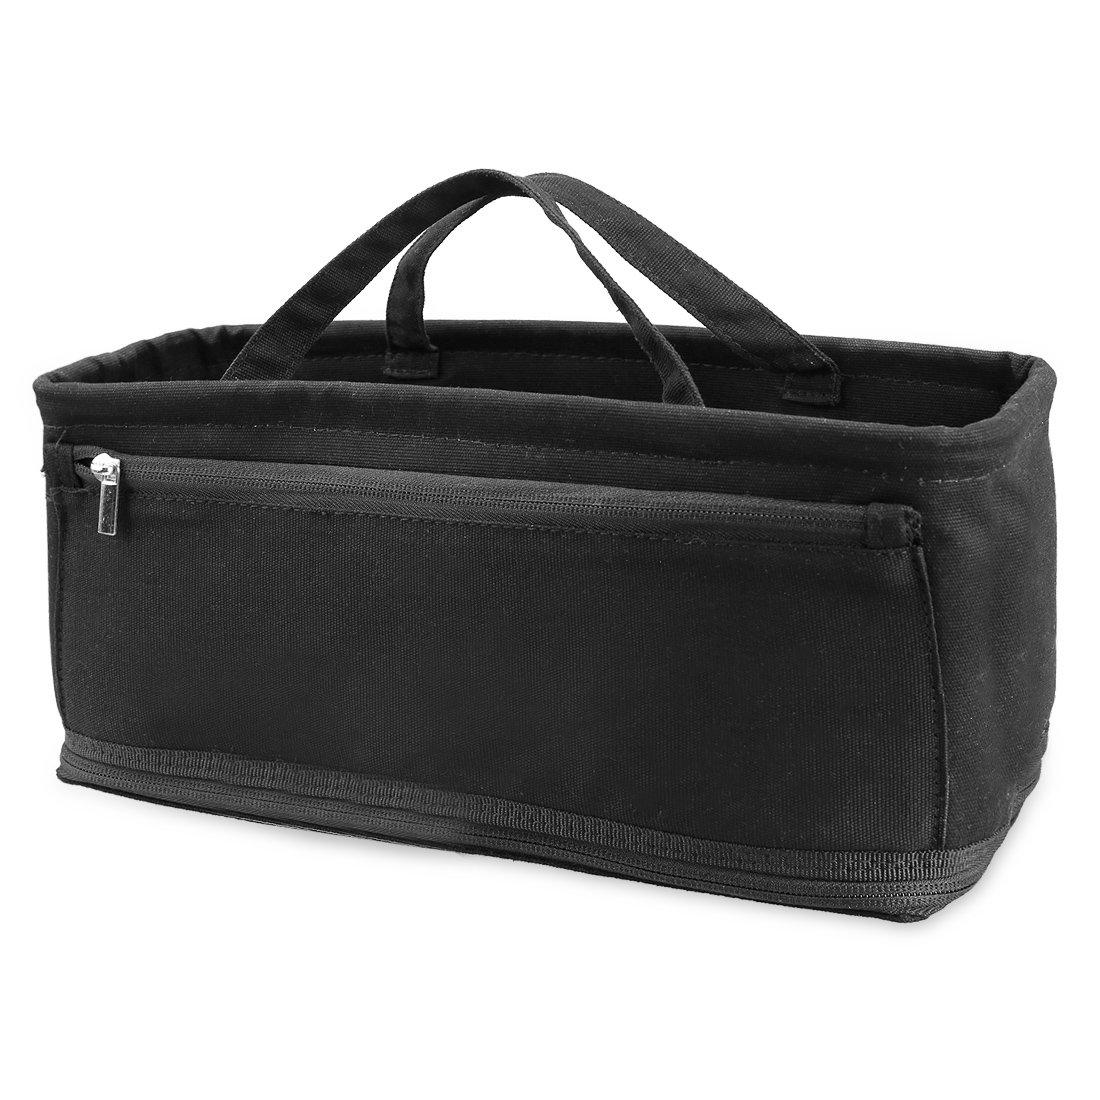 Ava & Kings Handbag Purse Organizer Insert Multipocket Large Tote Bag Shaper | Fits XL Handbags, Diaper Bags, Backpack | Organize & Structure Any Bag - Solid Black